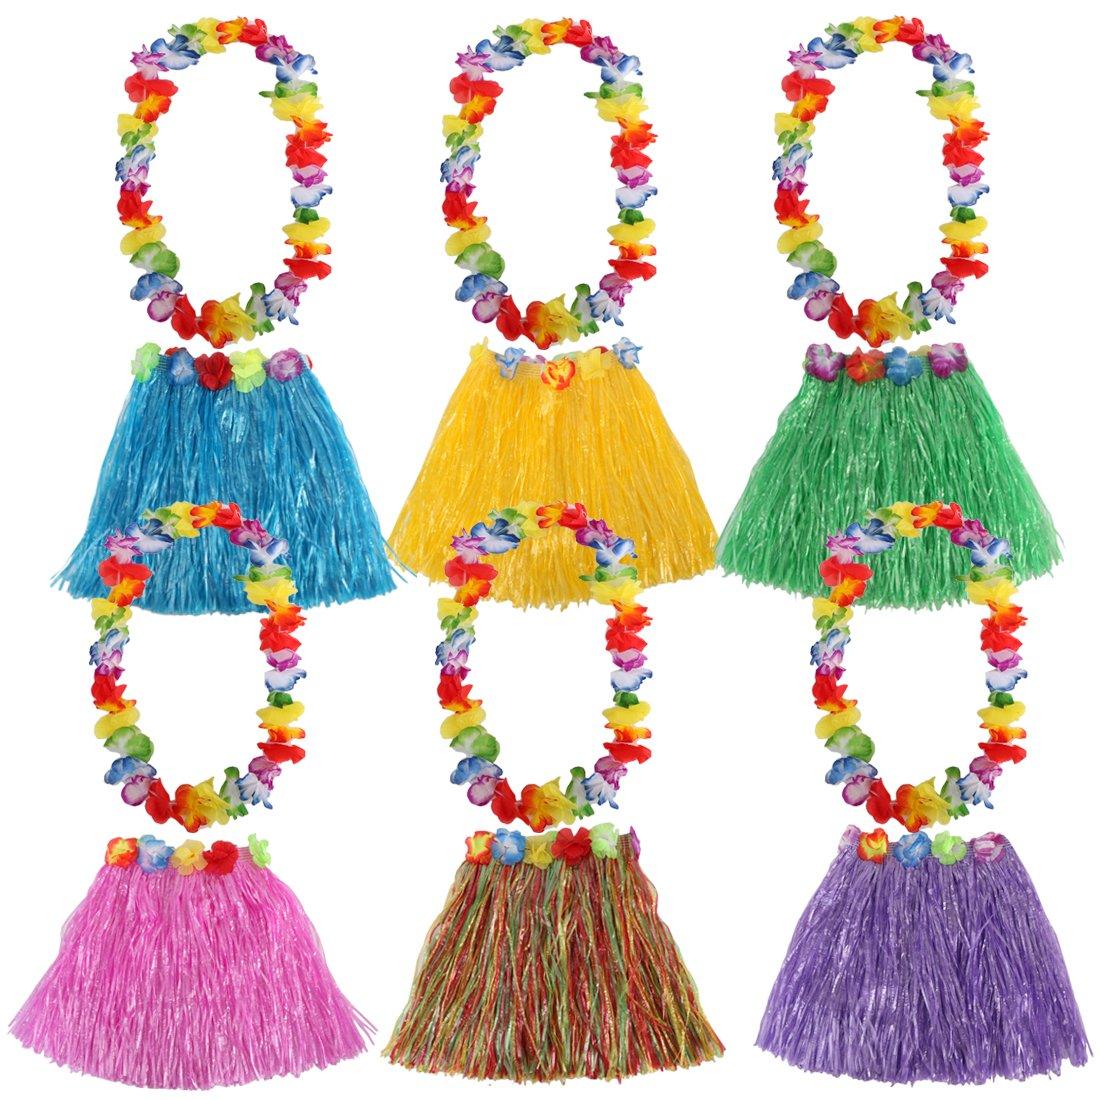 kilofly 6 Sets Girls Elastic Hawaiian Dancer Grass Hula Skirt Floral Lei Costume